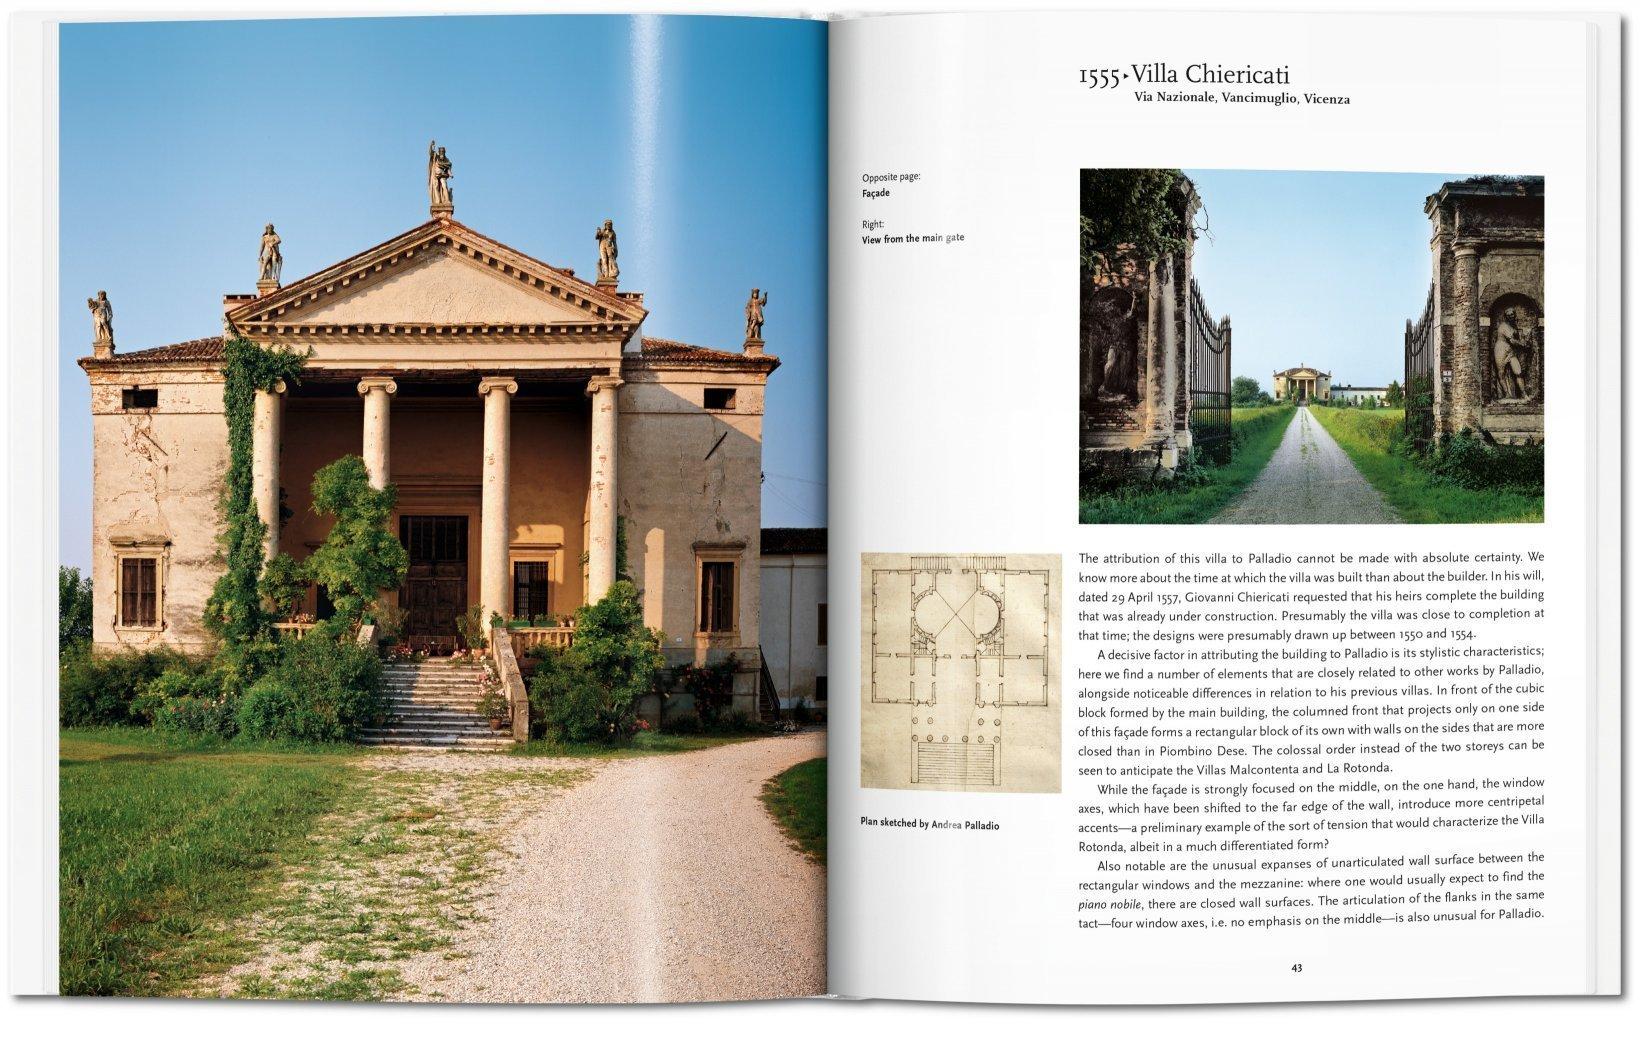 Palladio manfred wundram 9783836550215 amazon books fandeluxe Gallery